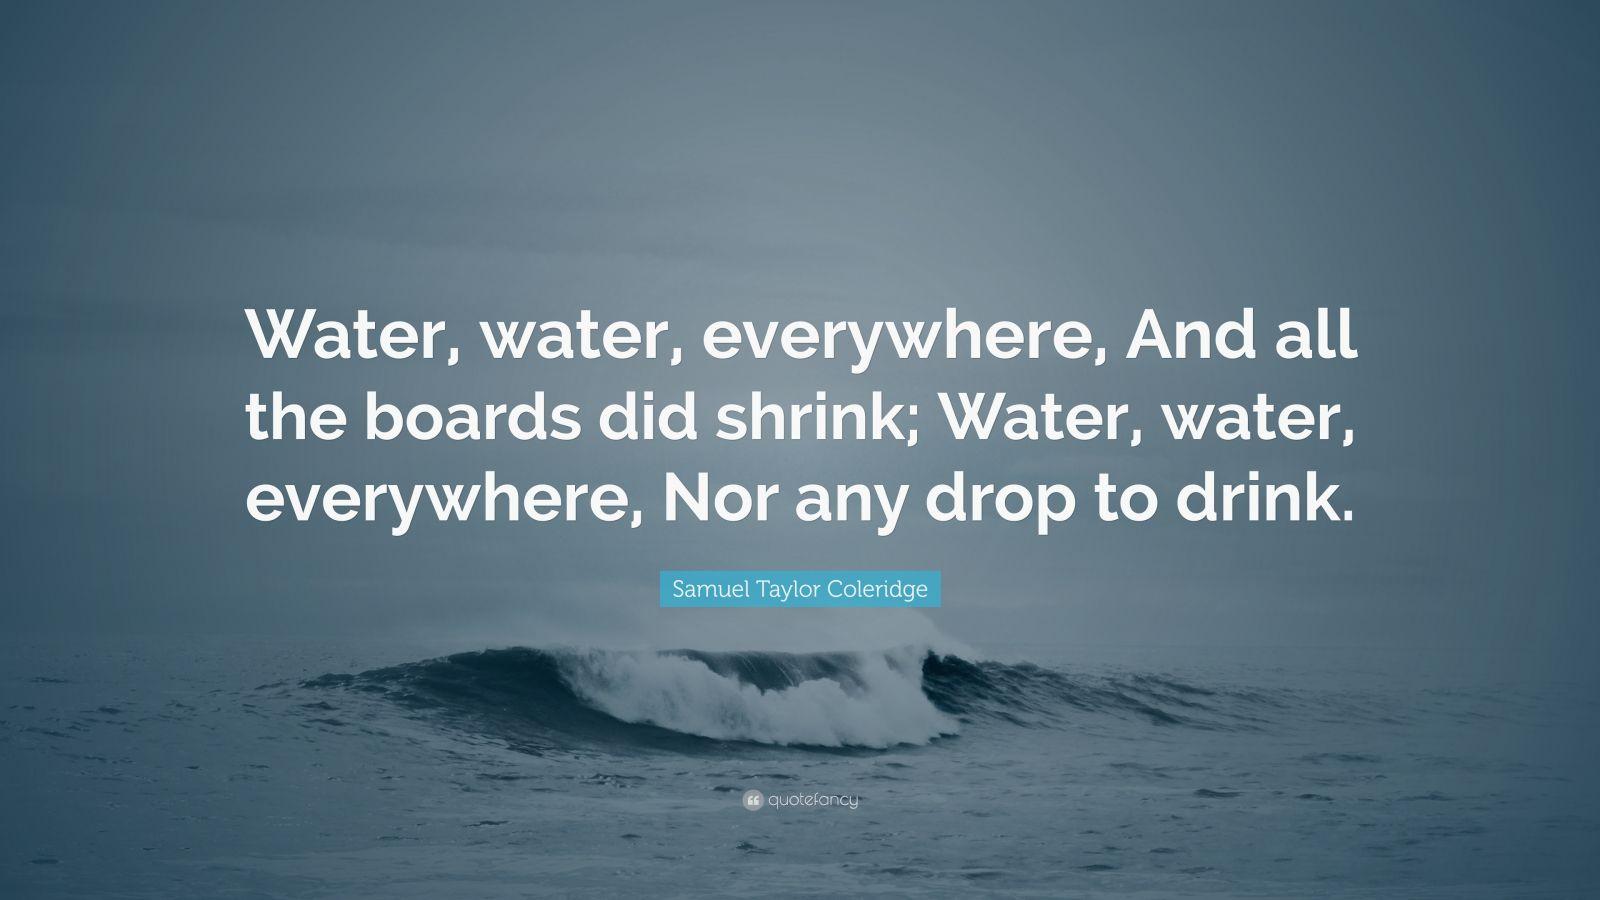 Samuel Taylor Coleridge Quote: Water, water, everywhere